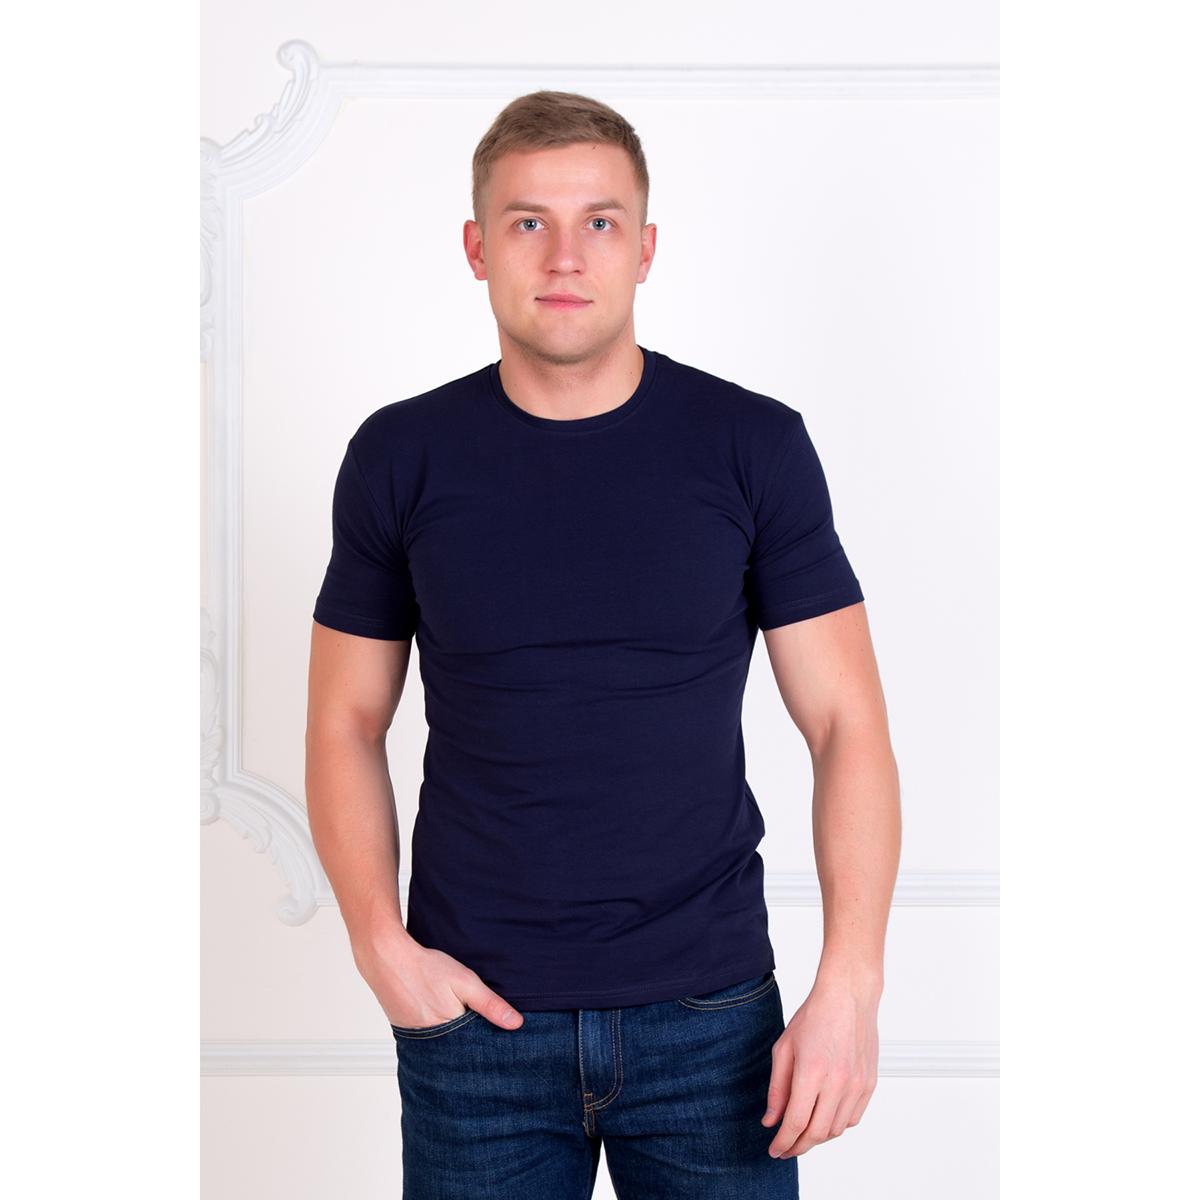 Мужская футболка Алекс Синий, размер 50Футболки и майки<br>Обхват груди:100 см<br>Обхват талии:92 см<br>Обхват бедер:106 см<br>Рост:176-182 см<br><br>Тип: Муж. футболка<br>Размер: 50<br>Материал: Фулайкра